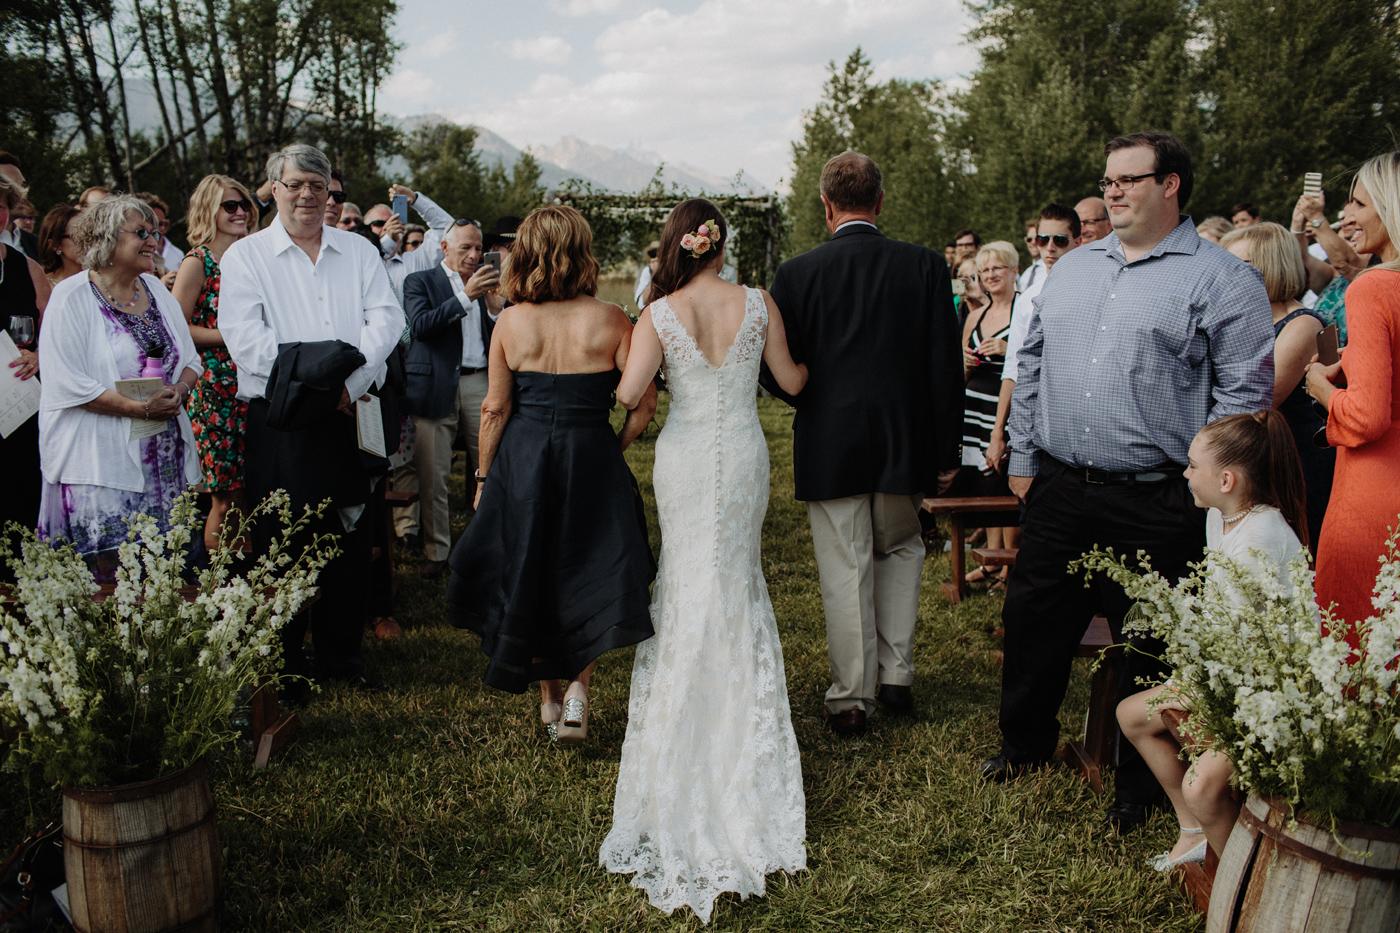 025-grand-teton-jackson-hole-wyoming-wedding.jpg